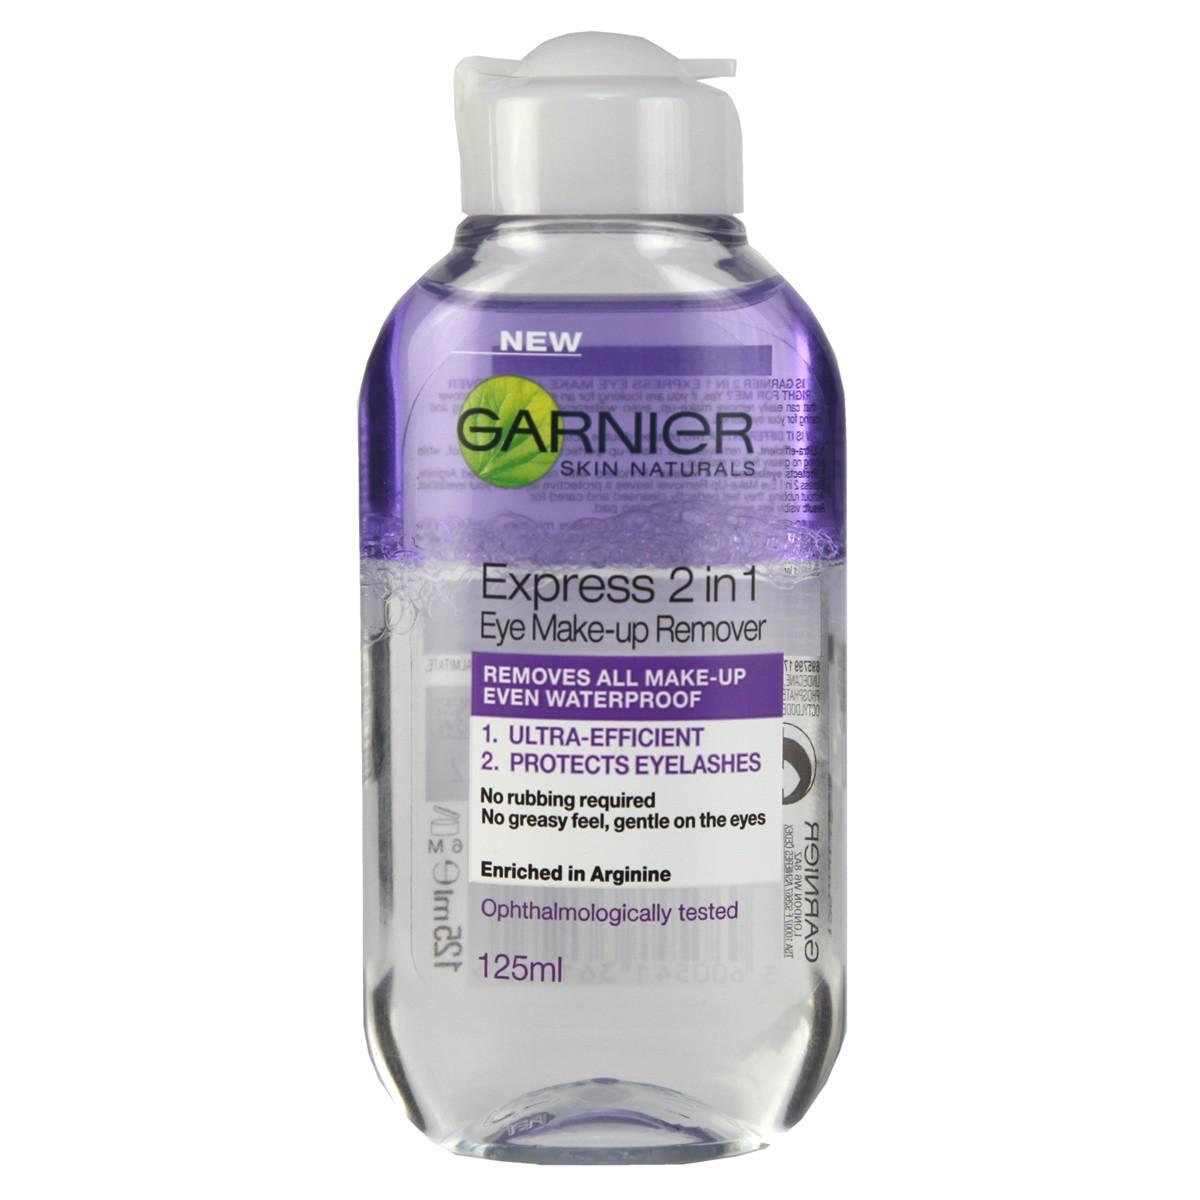 Garnier Express 2 in 1 Eye Make-up Remover 125 ml - UK ...